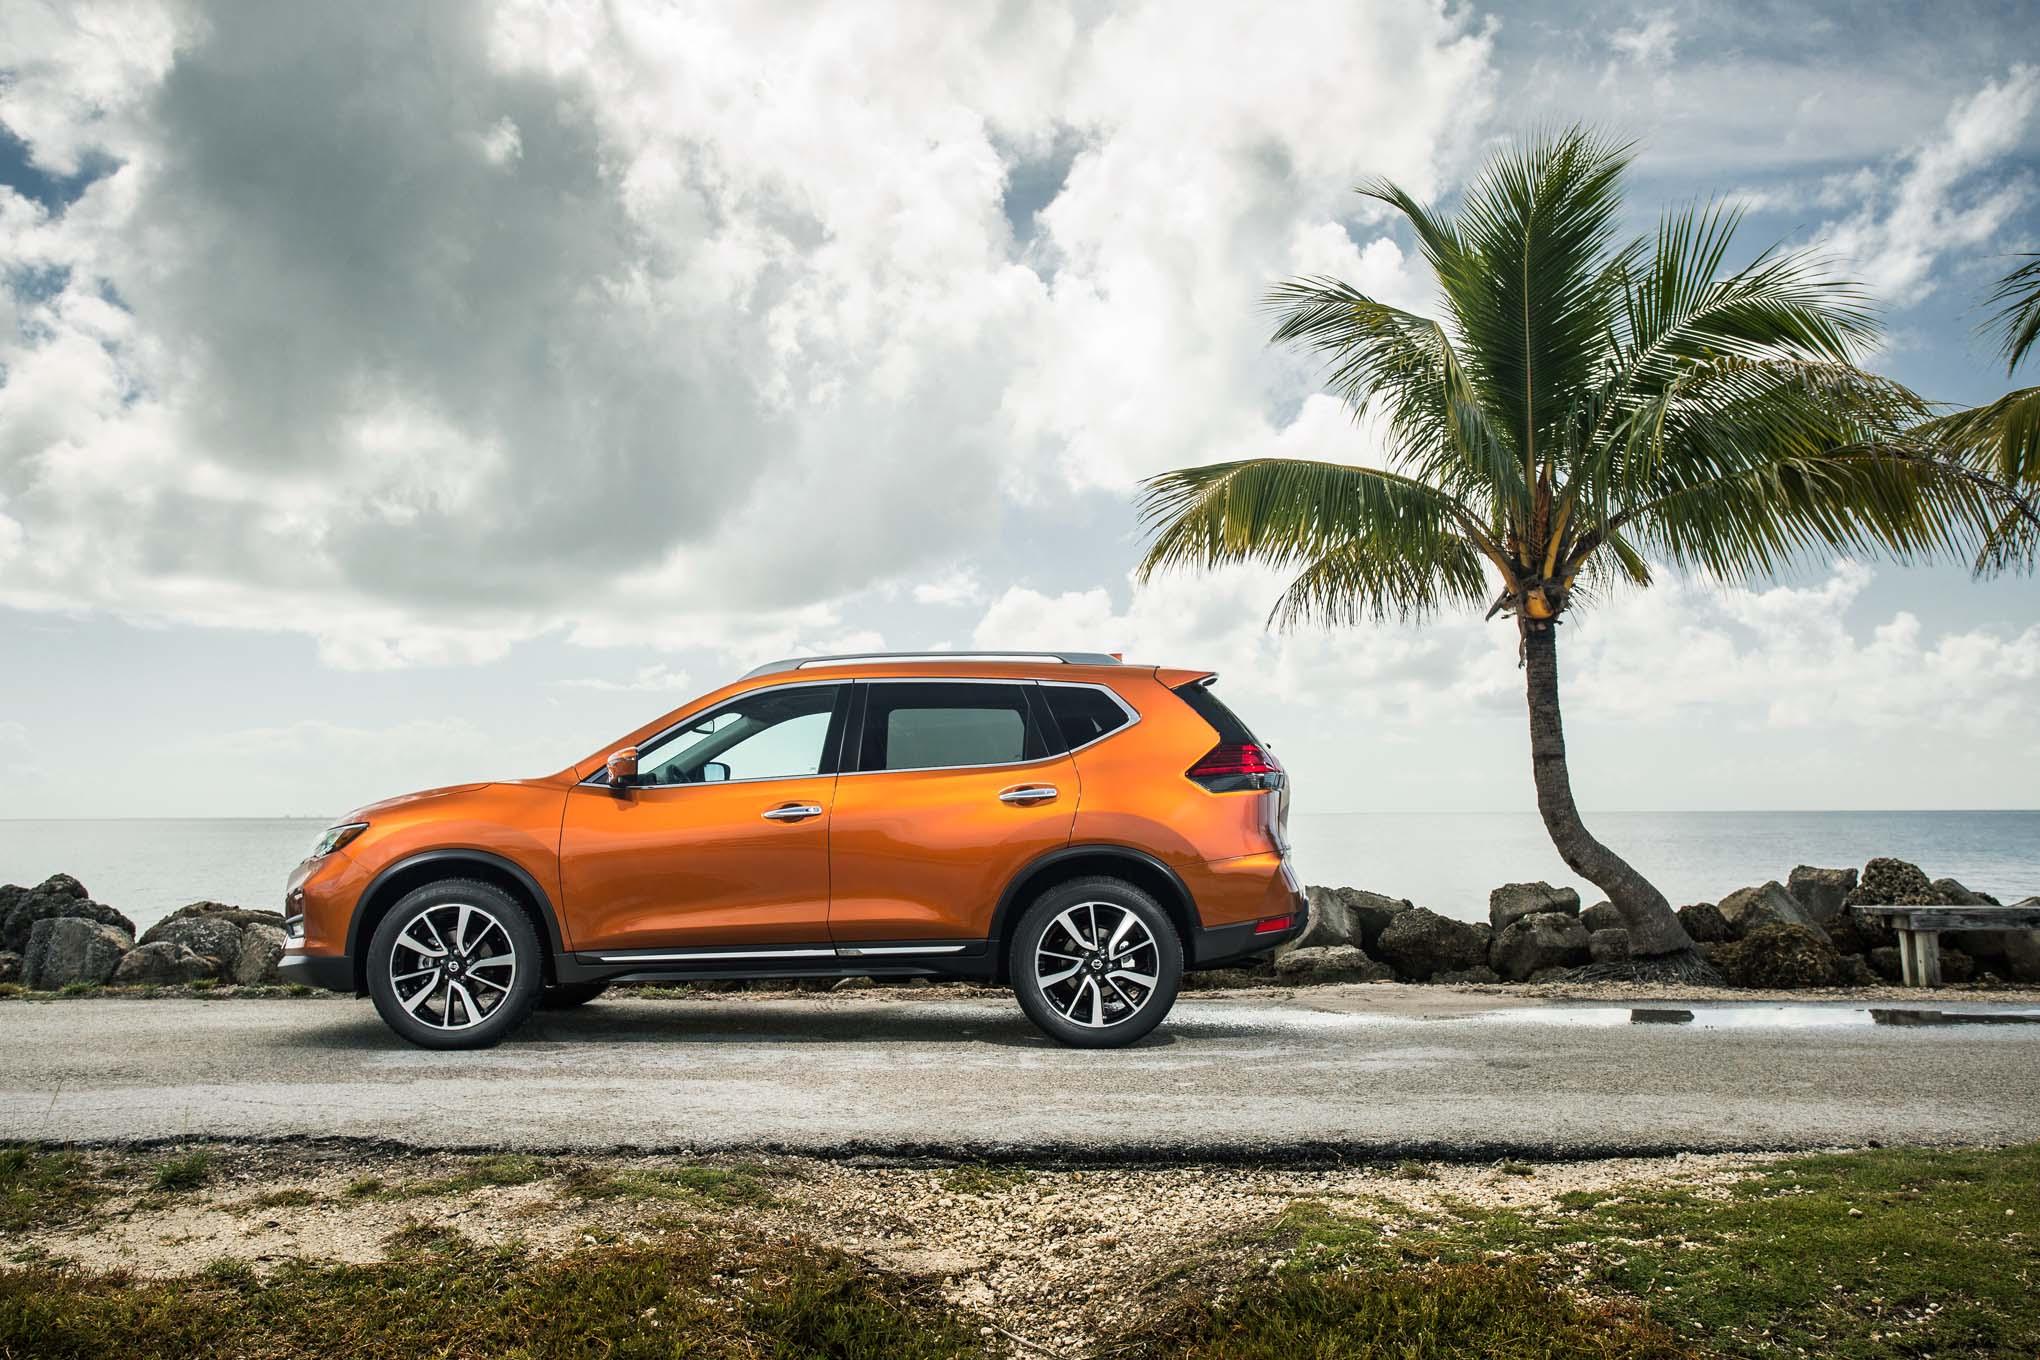 2017 Nissan Rogue SL AWD side profile